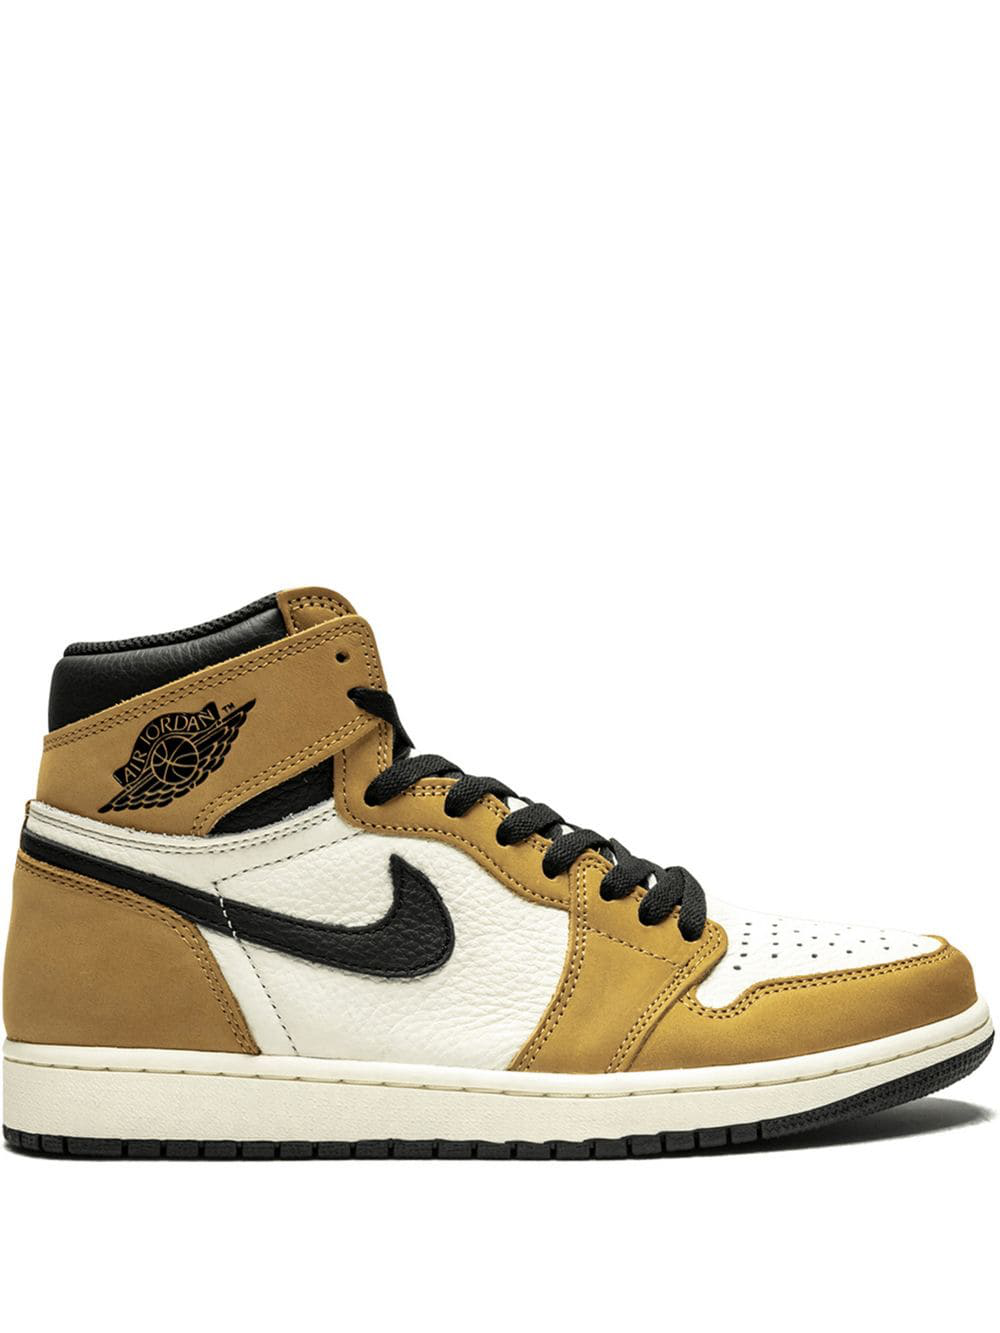 4902f76ca31 Jordan Air 1 High Og Nrg Sneakers - Brown | ModeSens